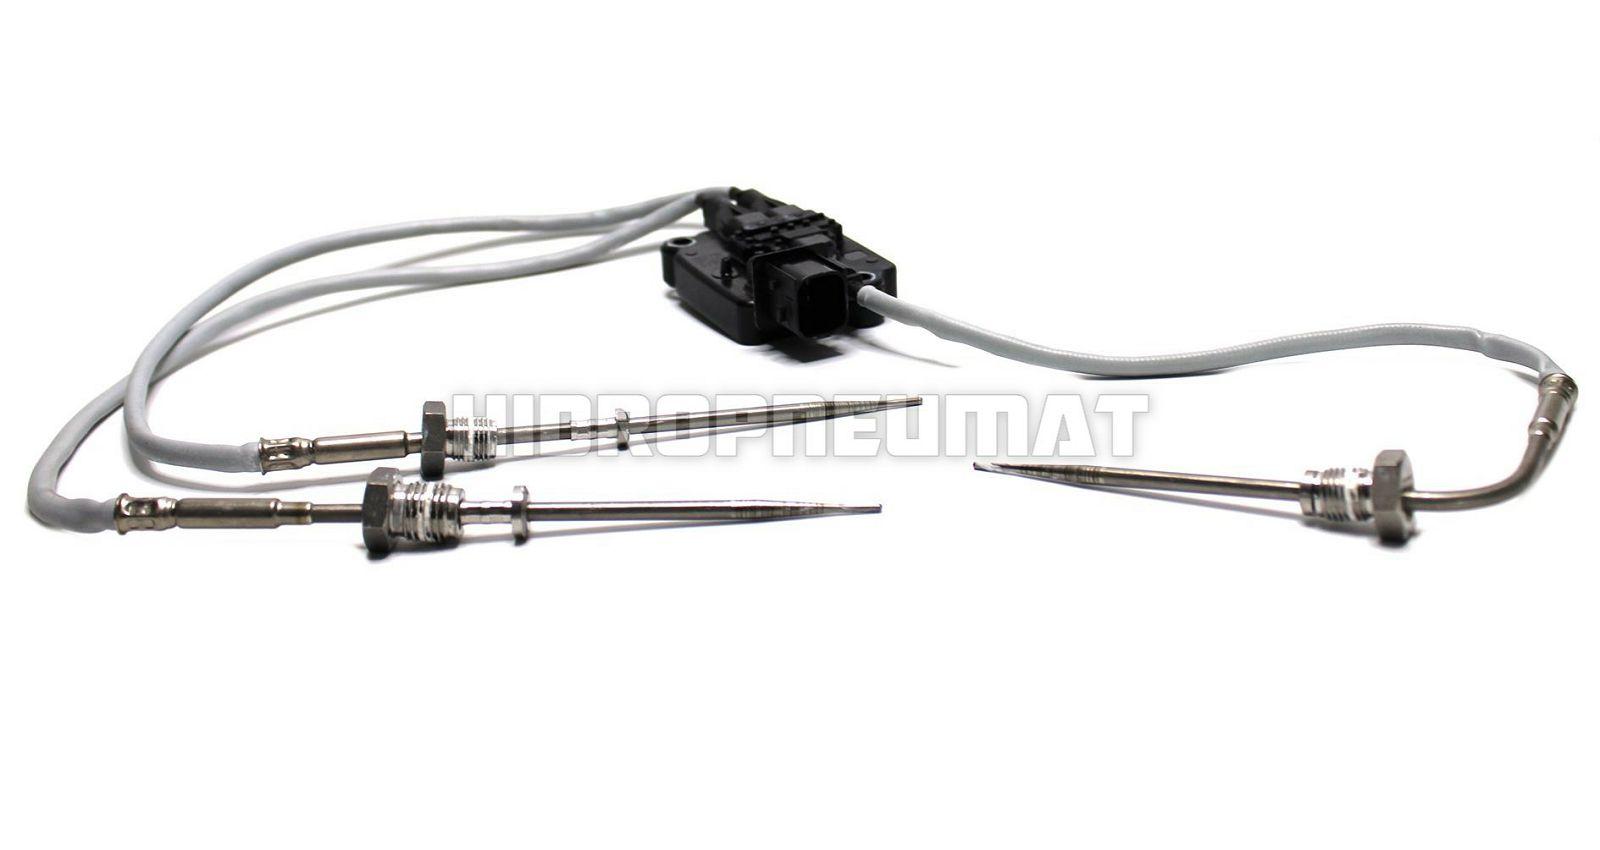 senzor-temperature-ispusnih-plinova-daf-euro6-125377_1.jpg